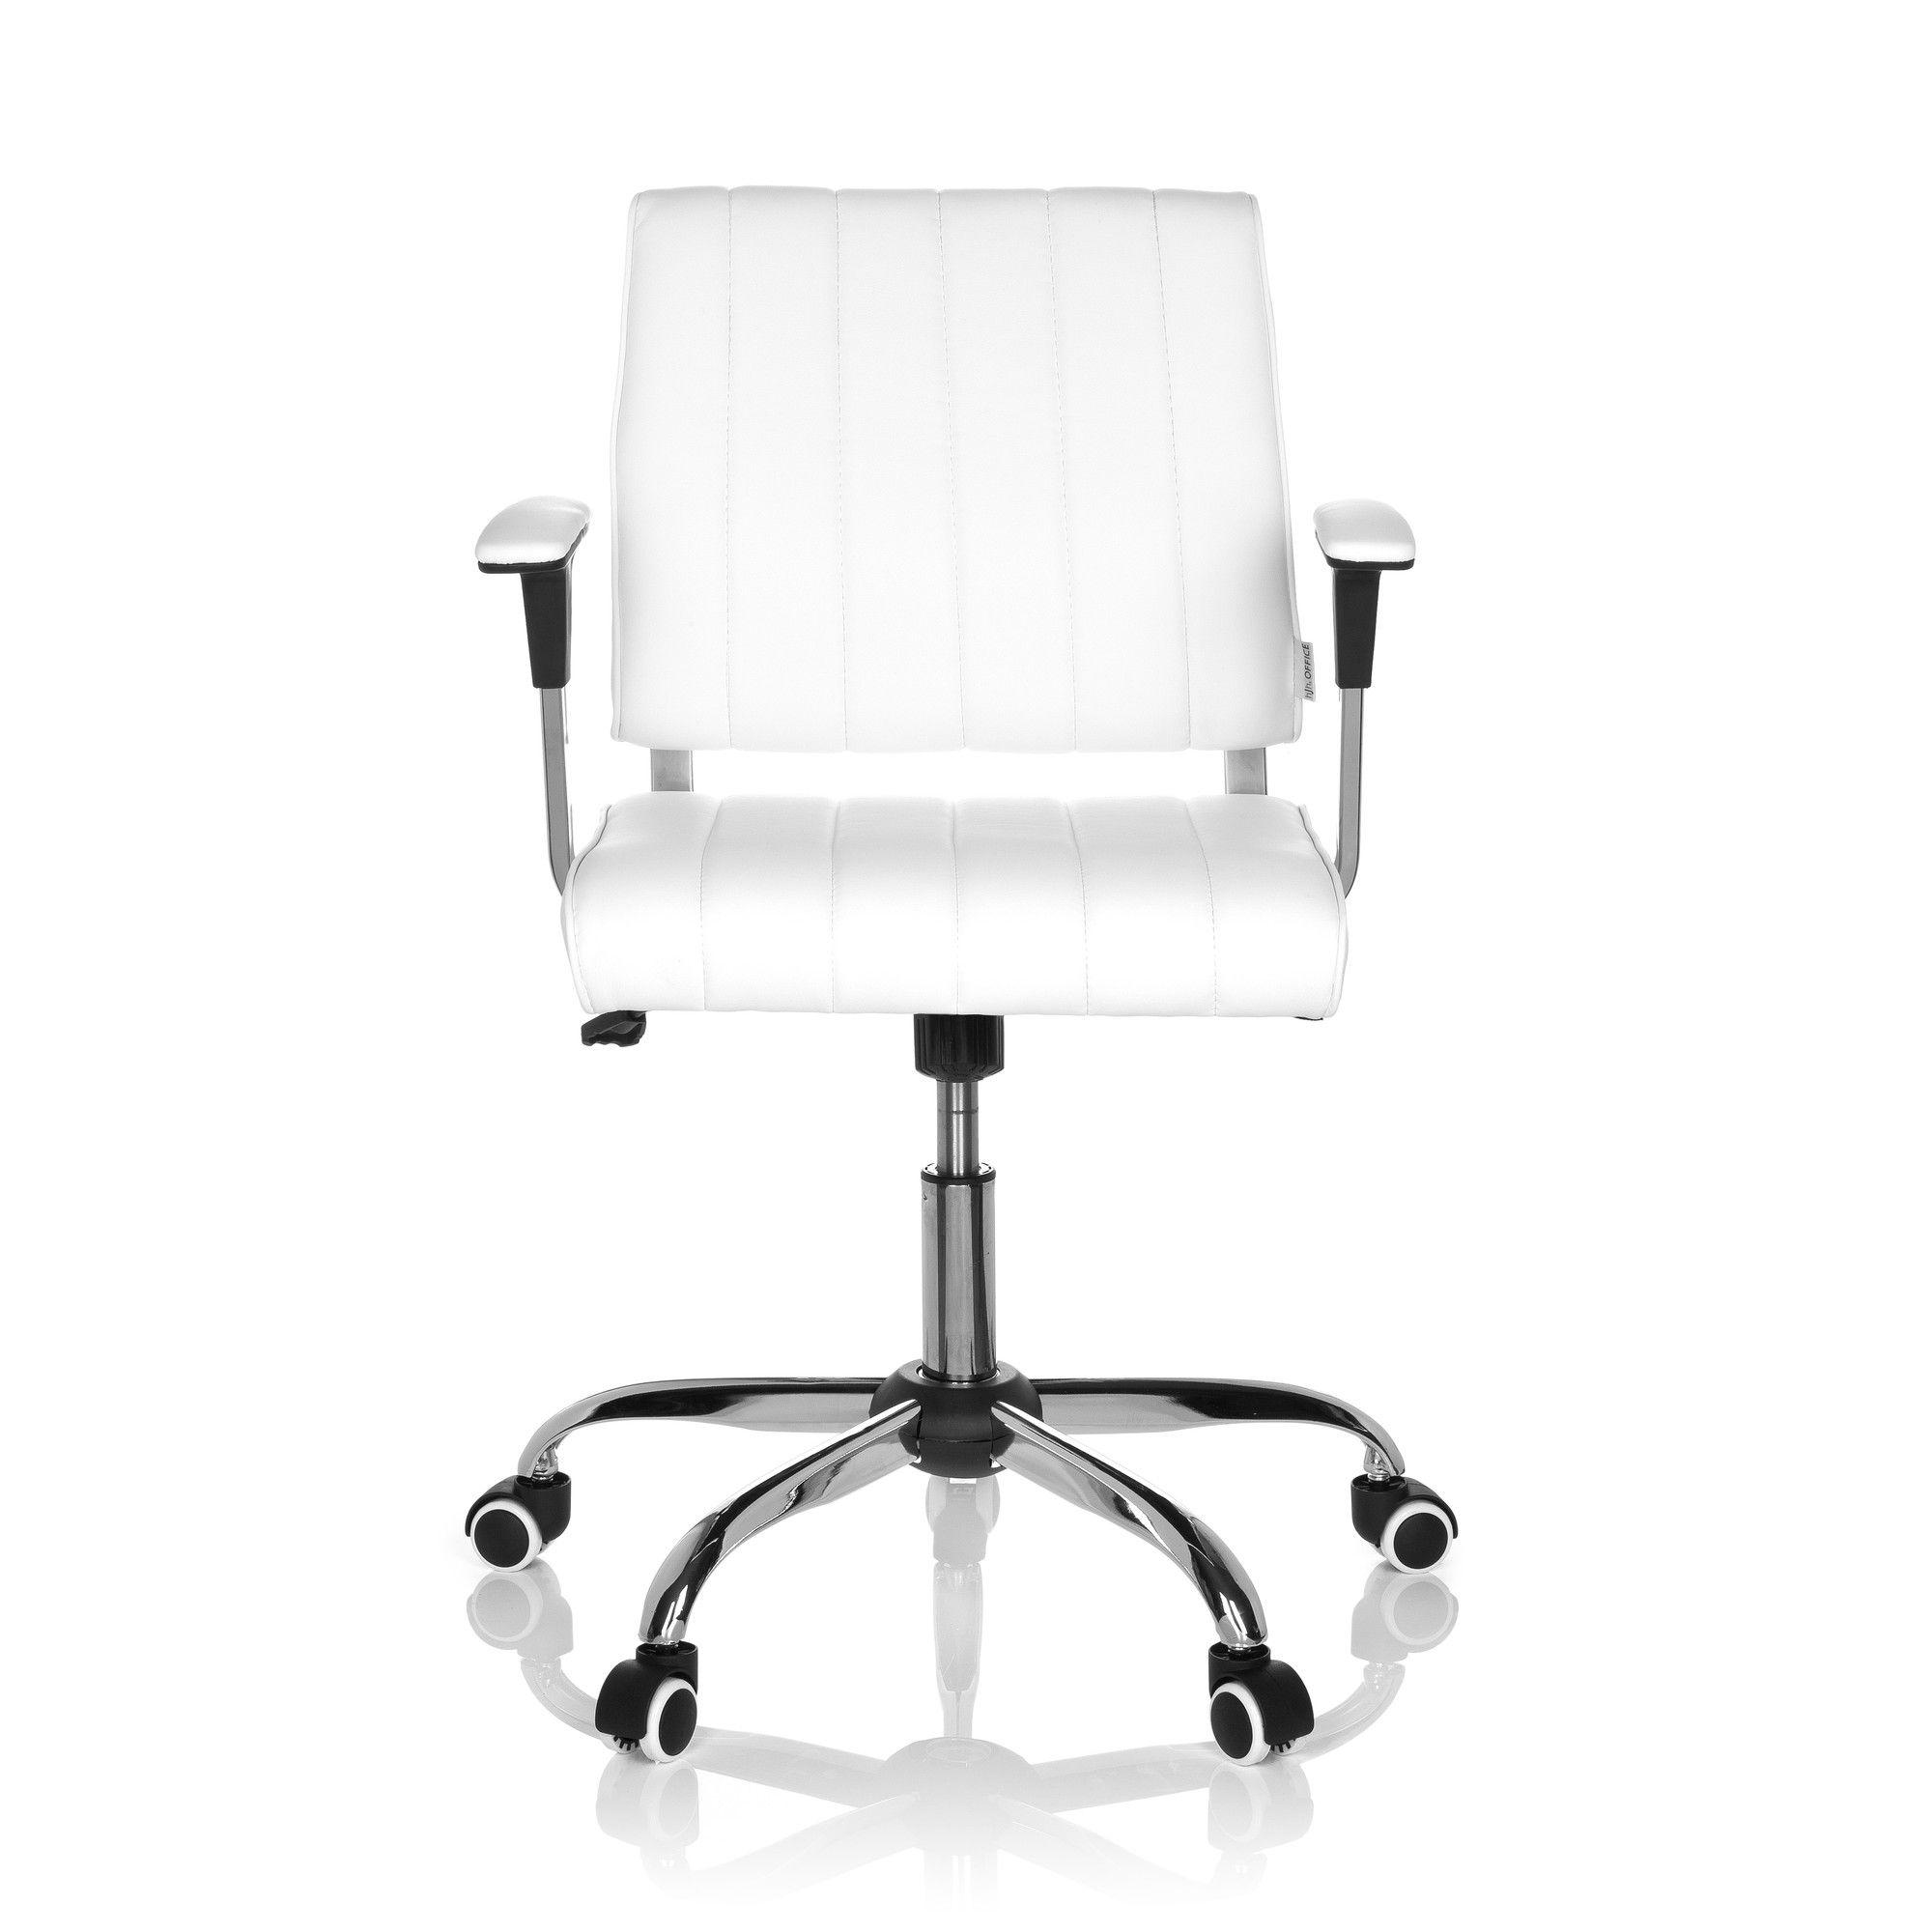 Chaise de bureau chaise pivotante fernando pu achat for Chaise de bureau cuir blanc